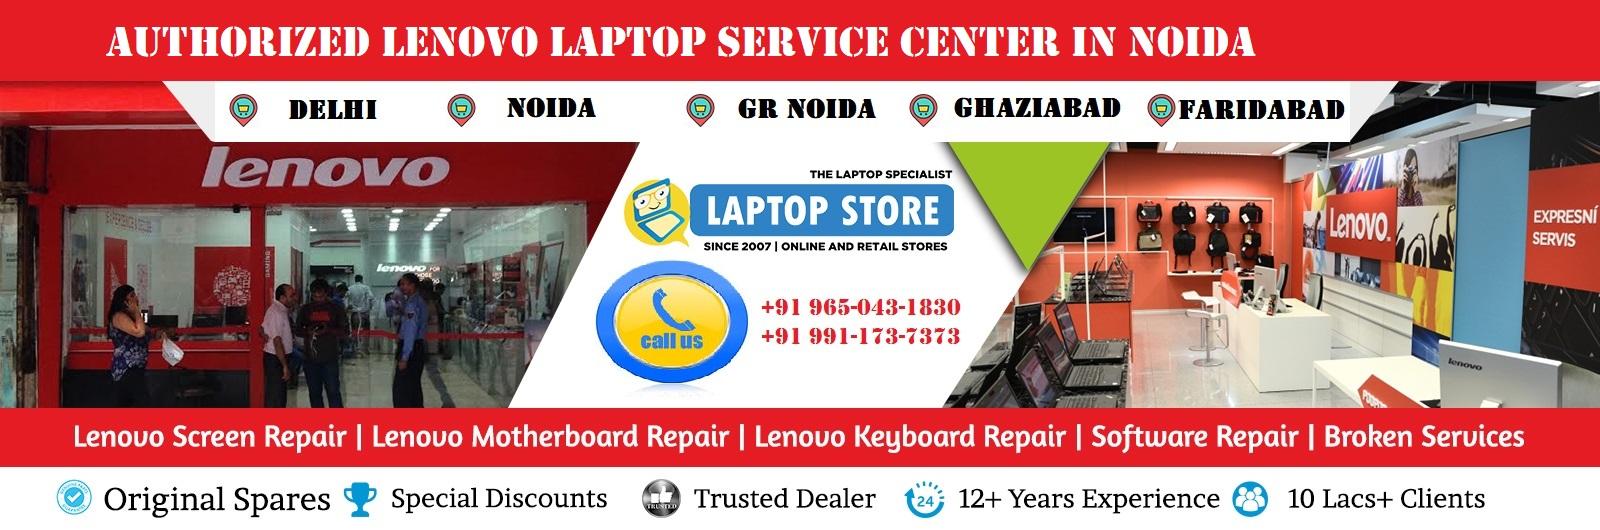 Lenovo authorized service center in Noida